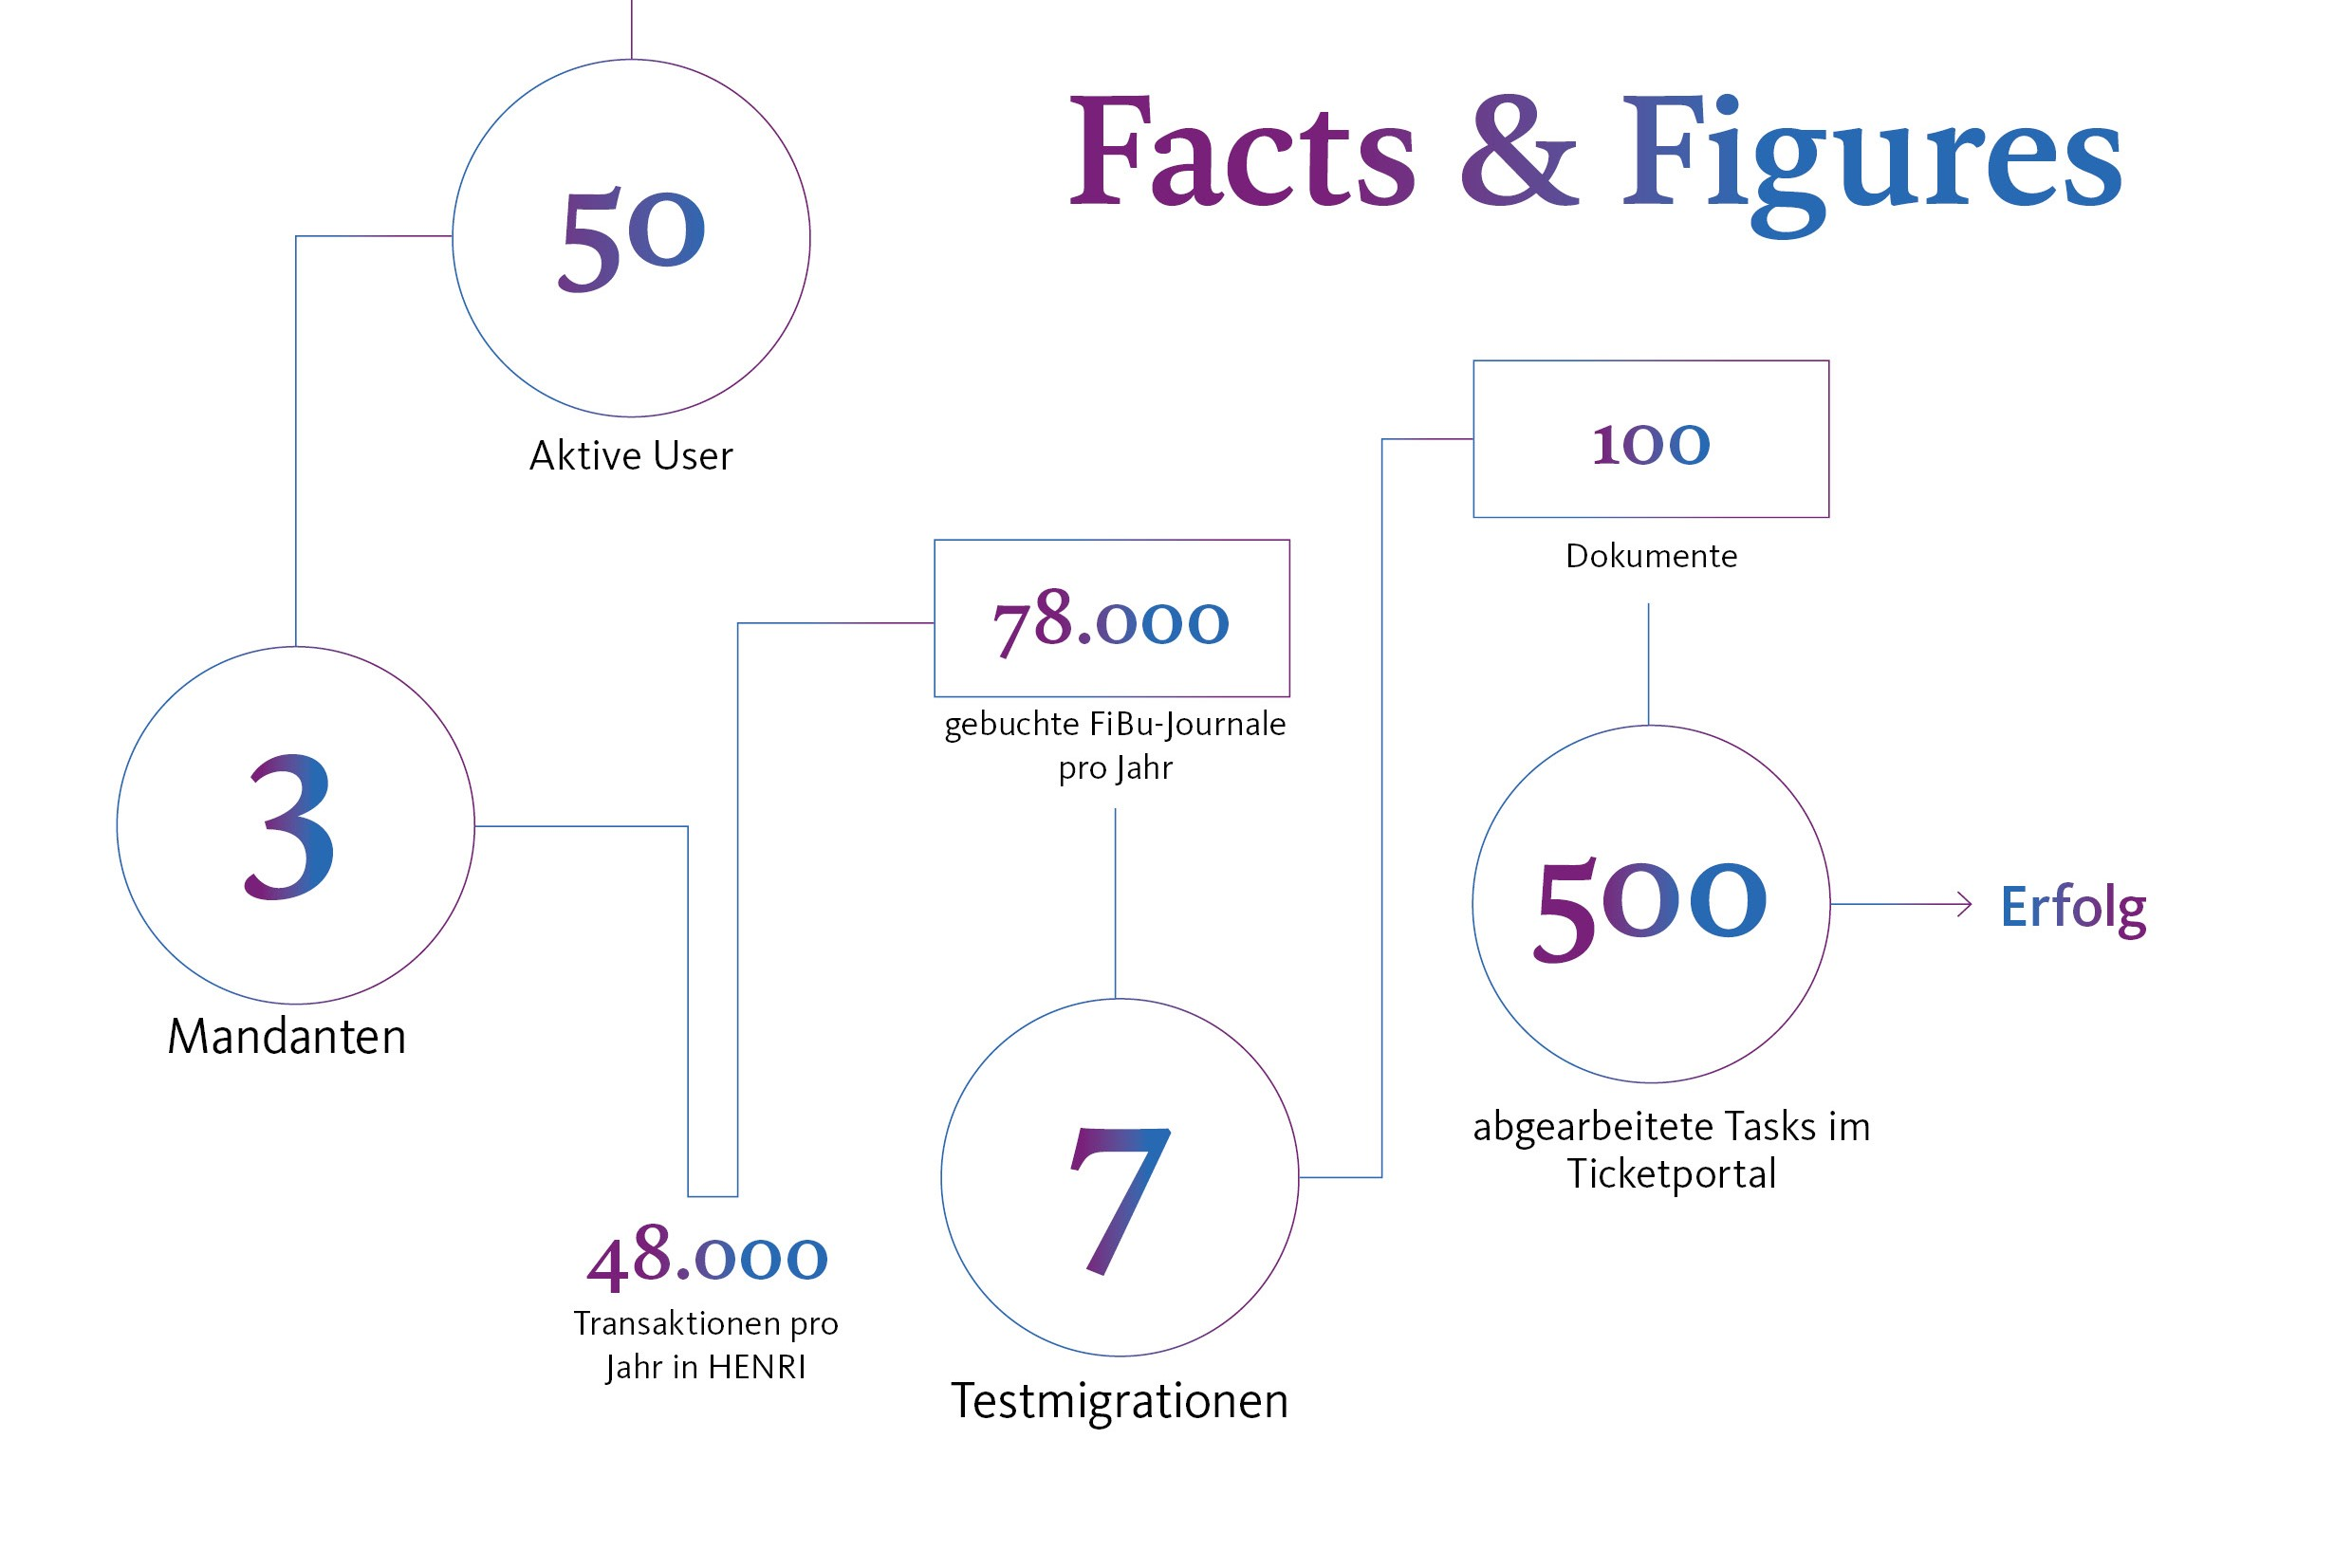 Facts & Figures Miller Leasing